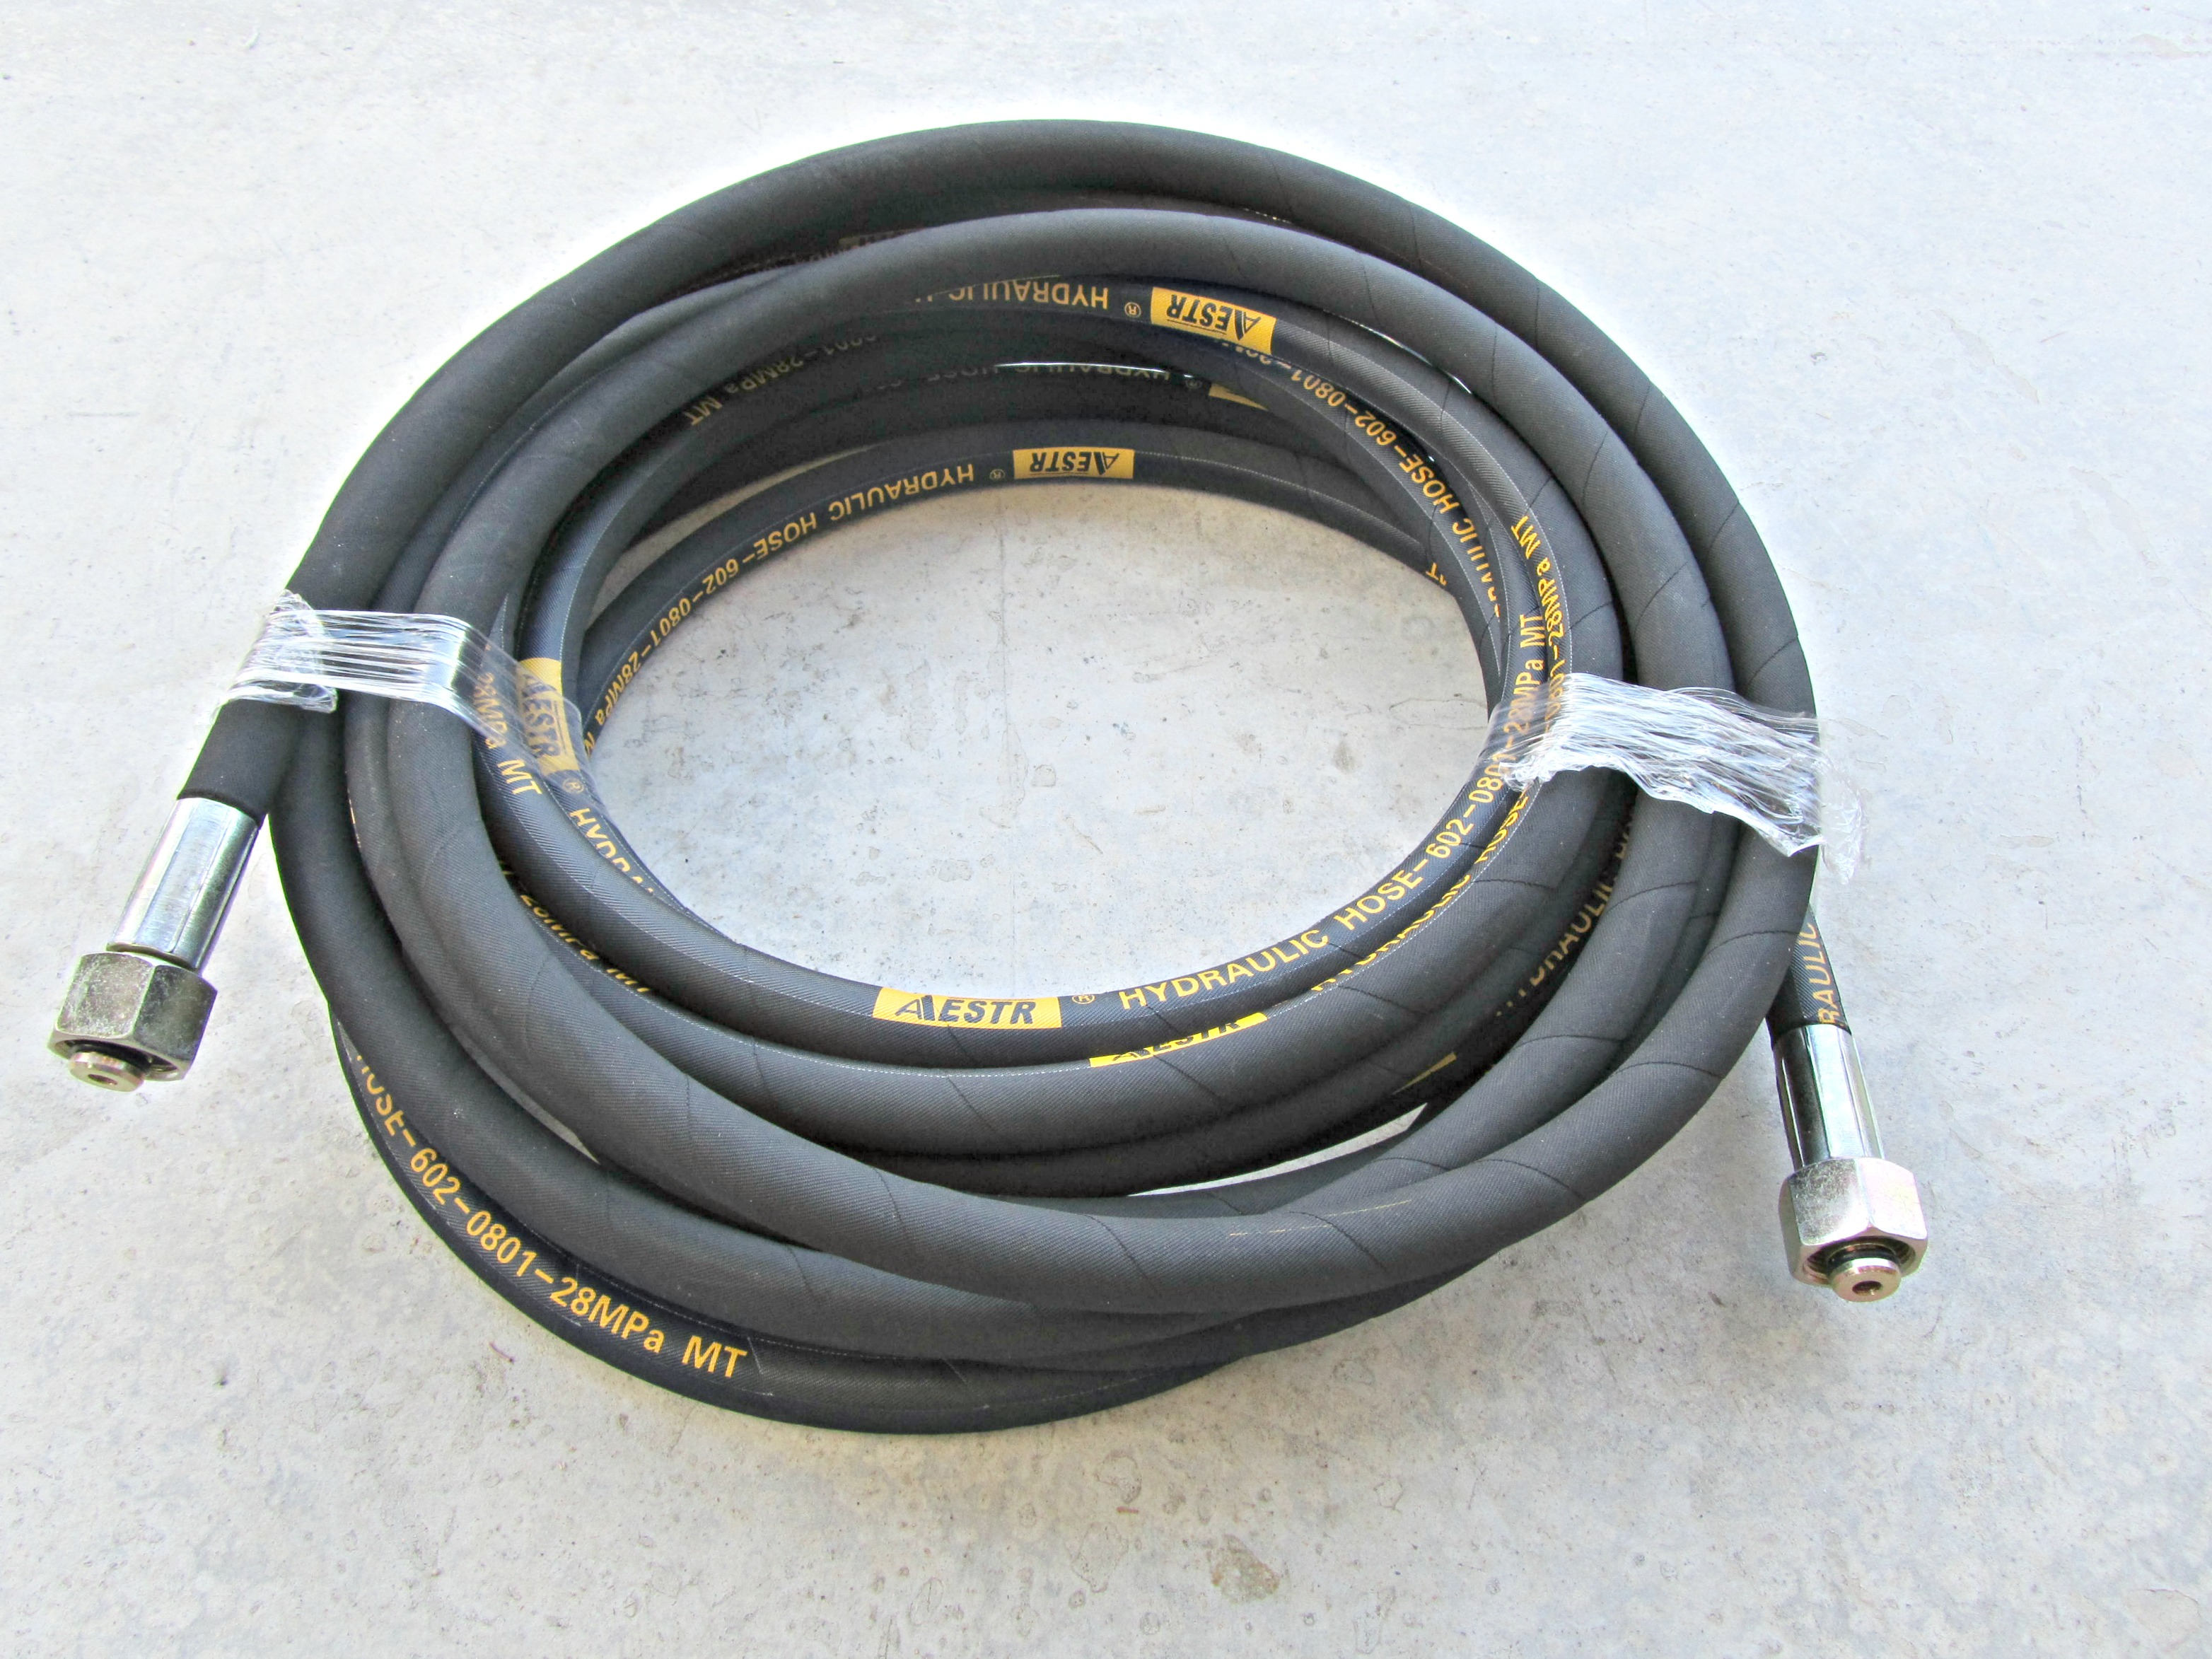 High Pressure Water Hose Fittings Braided High Pressure Hose